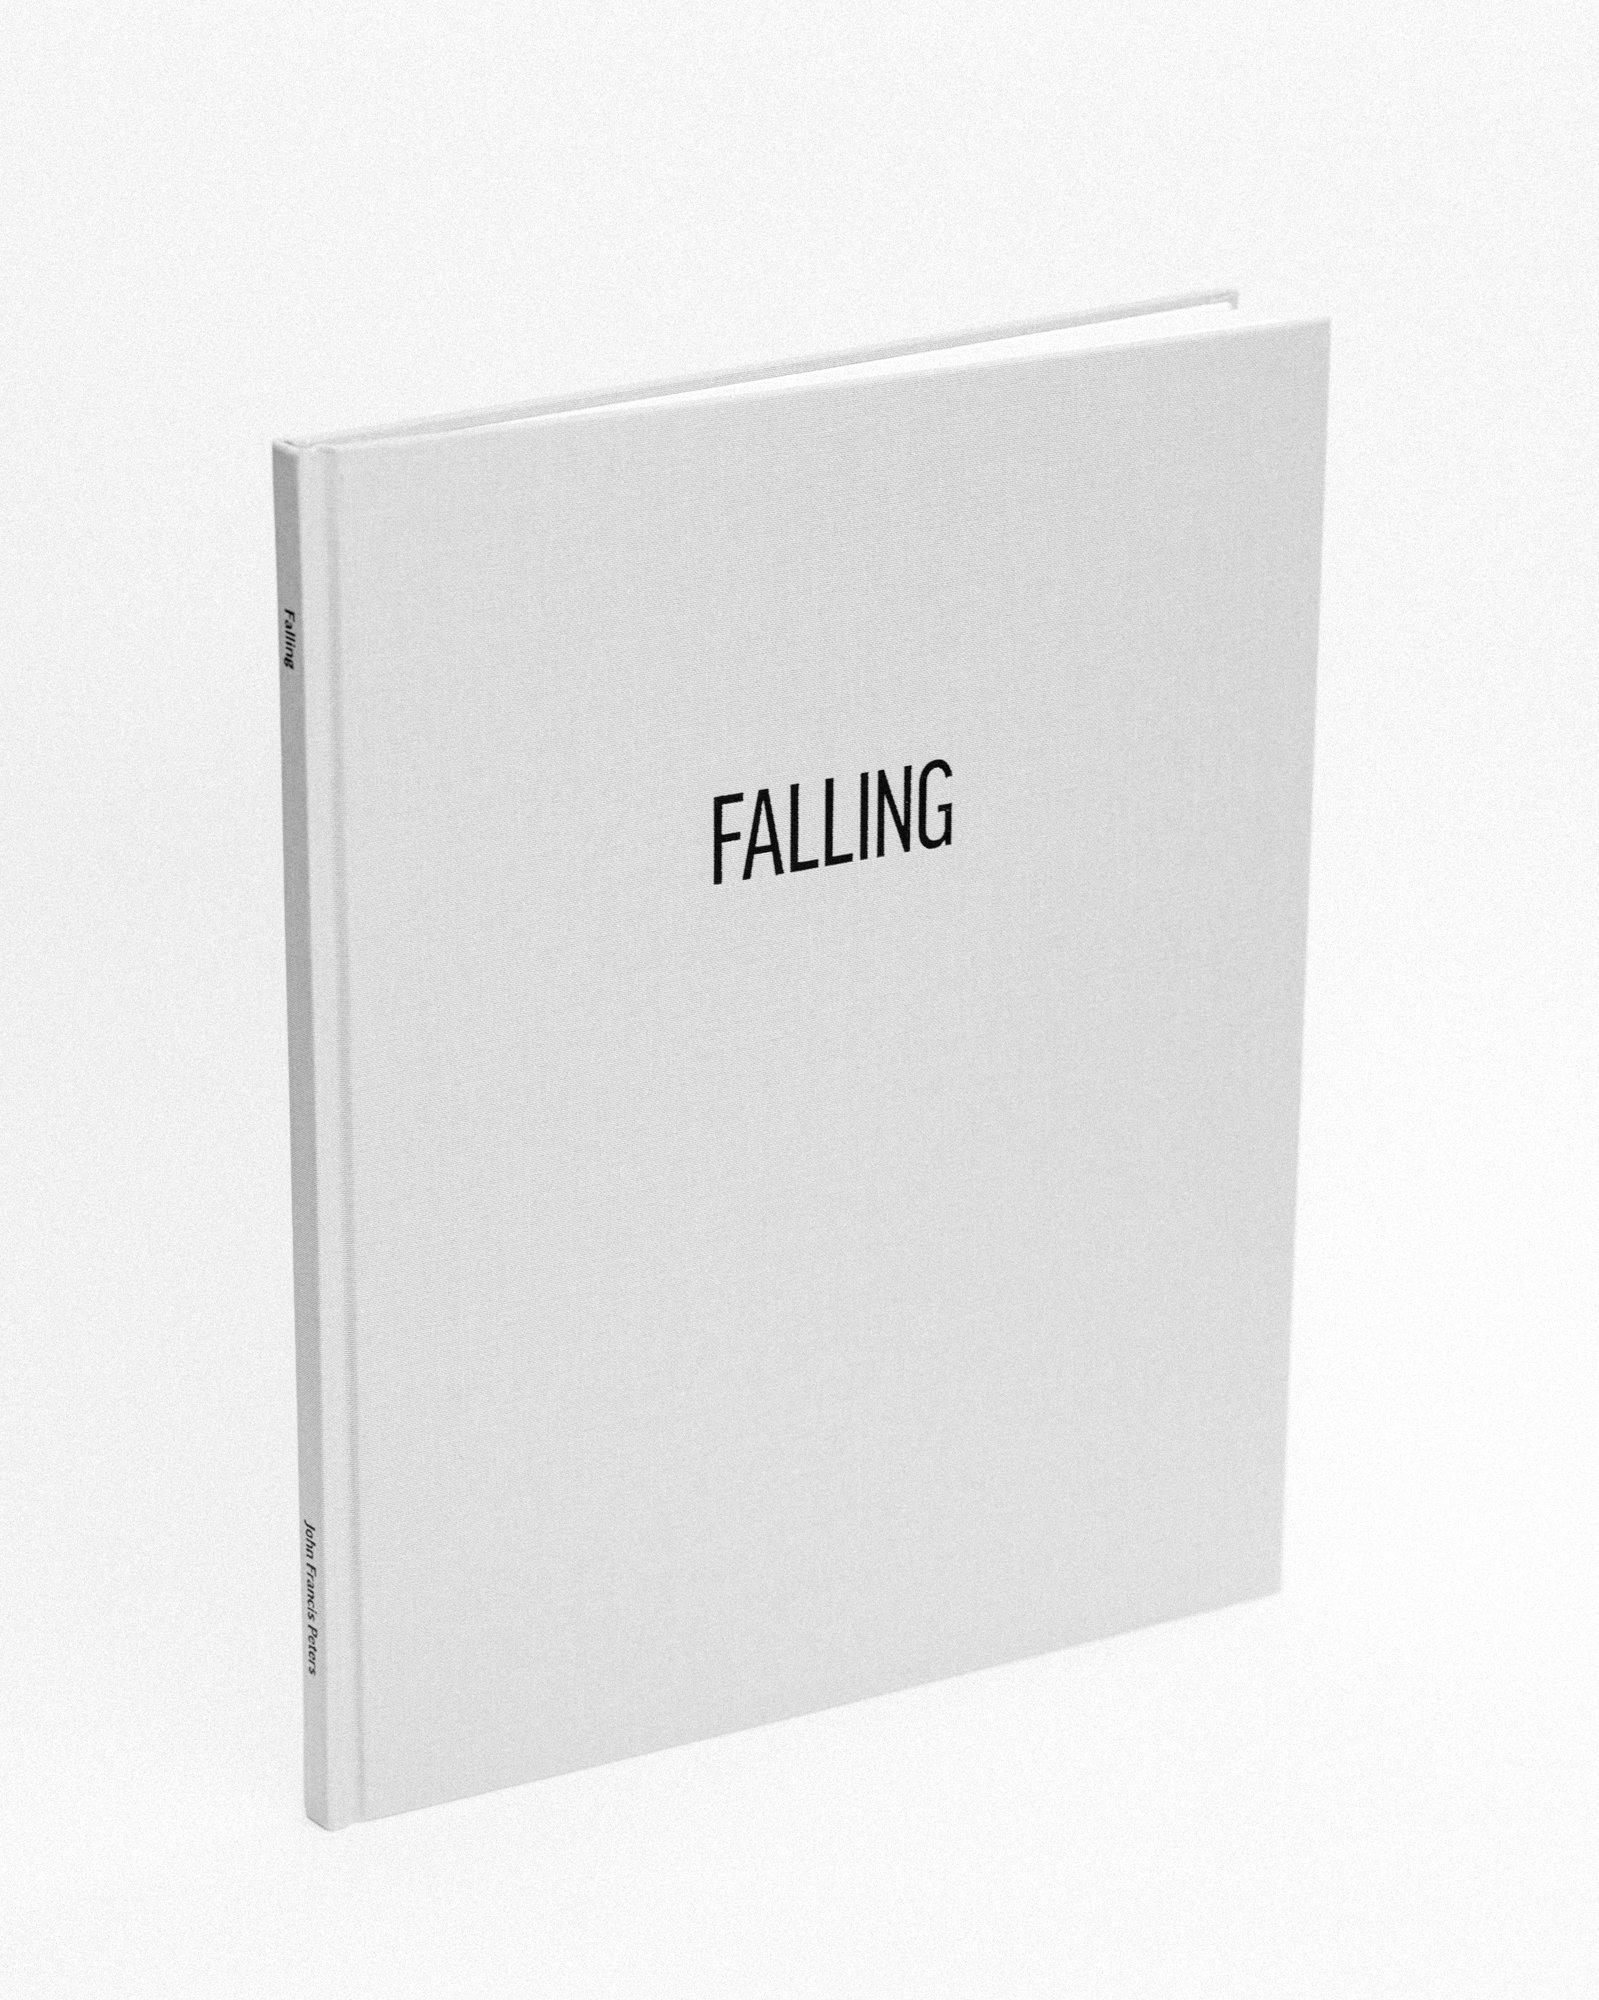 JohnFPeters_BOOK_FALLING01.JPG